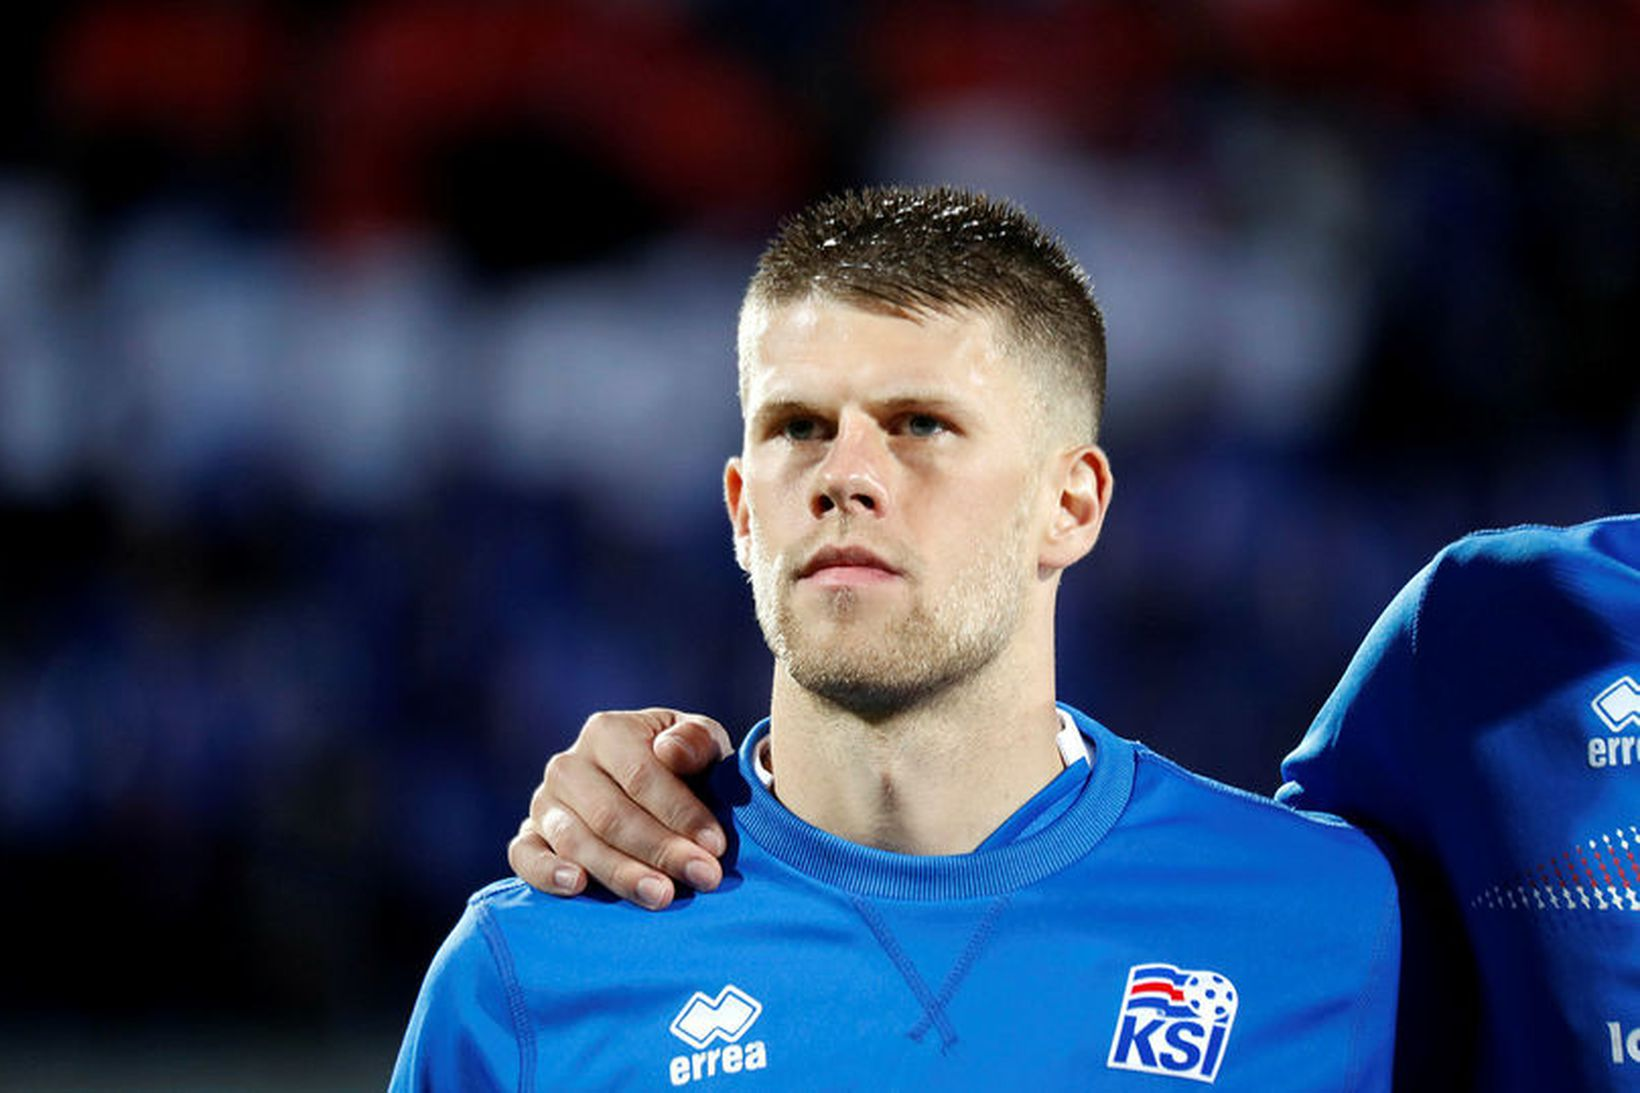 Jóhann Berg Guðmundsson